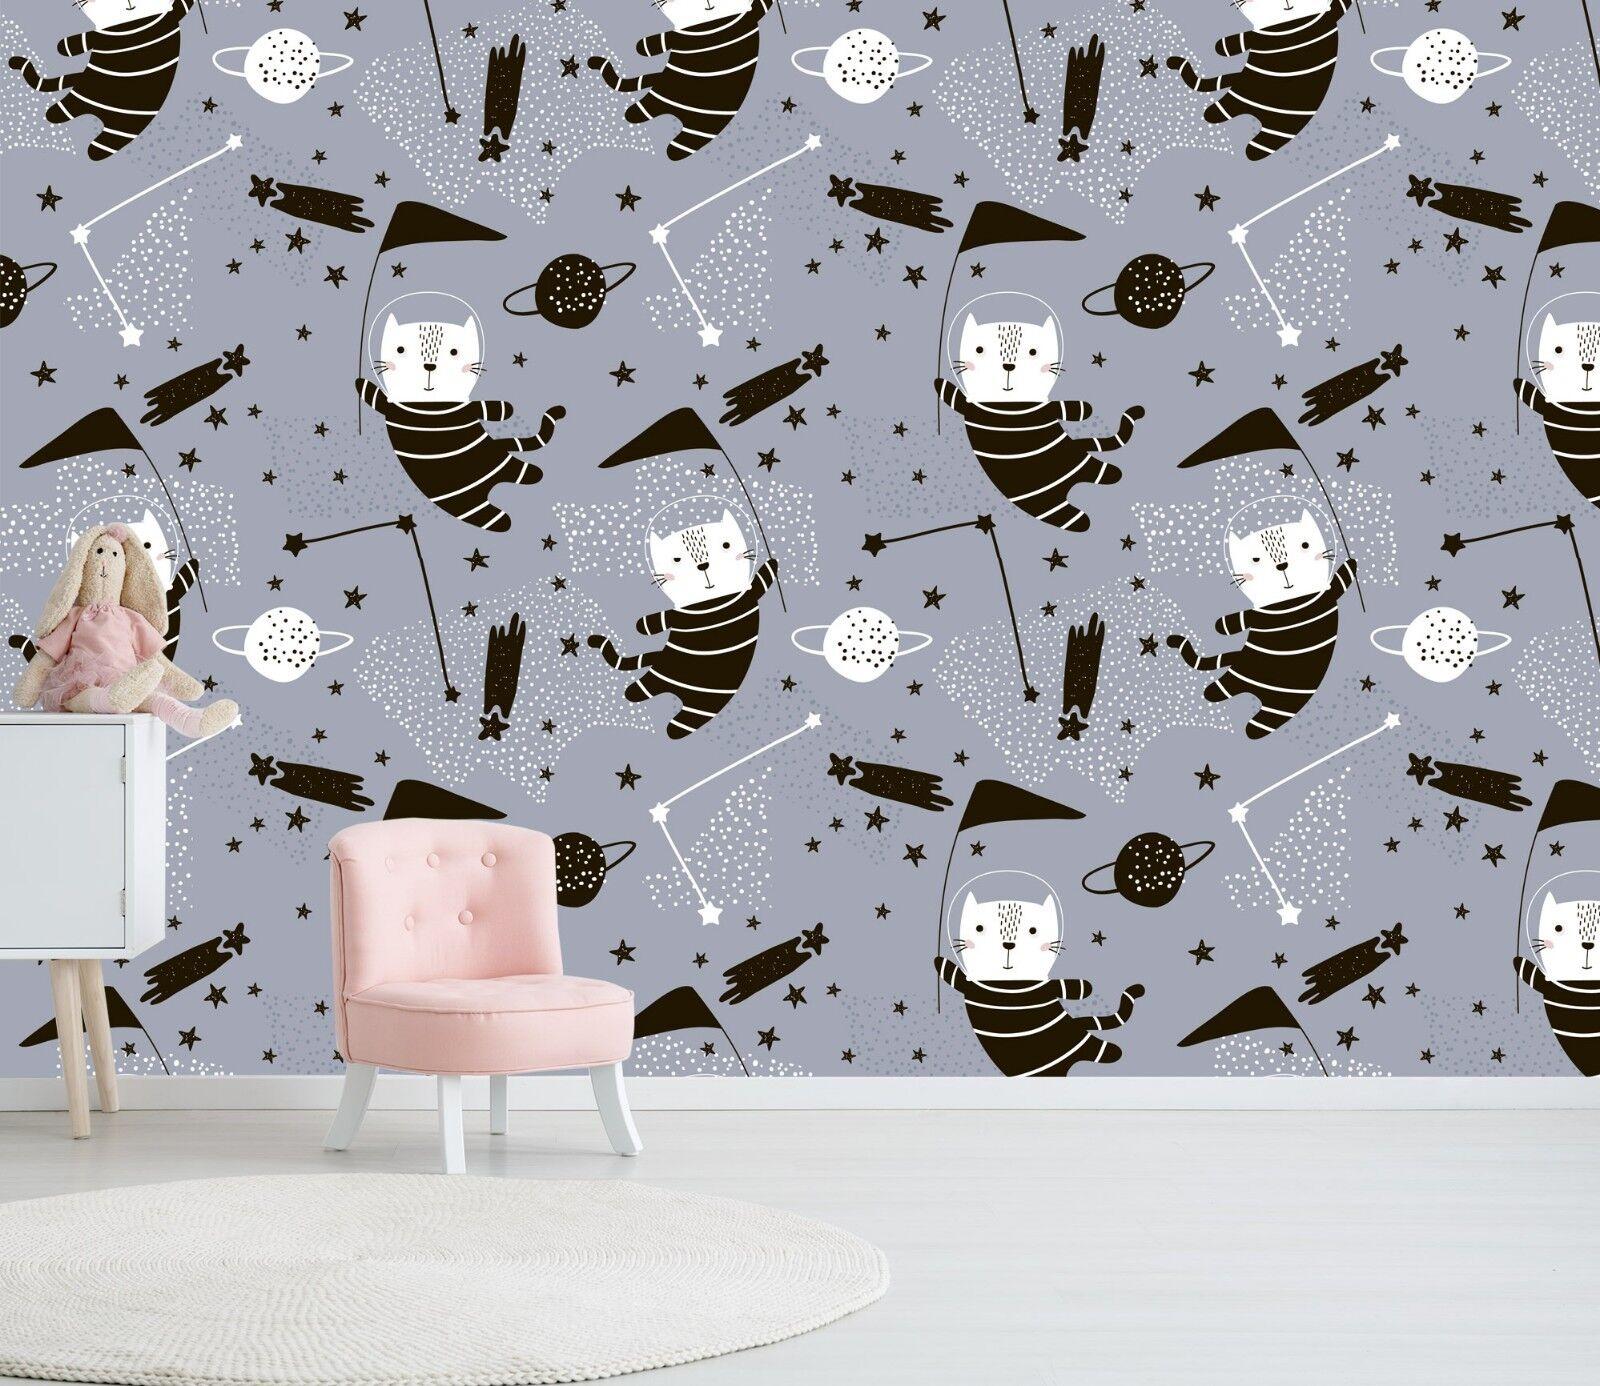 45 Universe Cat 3D Wallpaper Space AU WALL AJ Mural